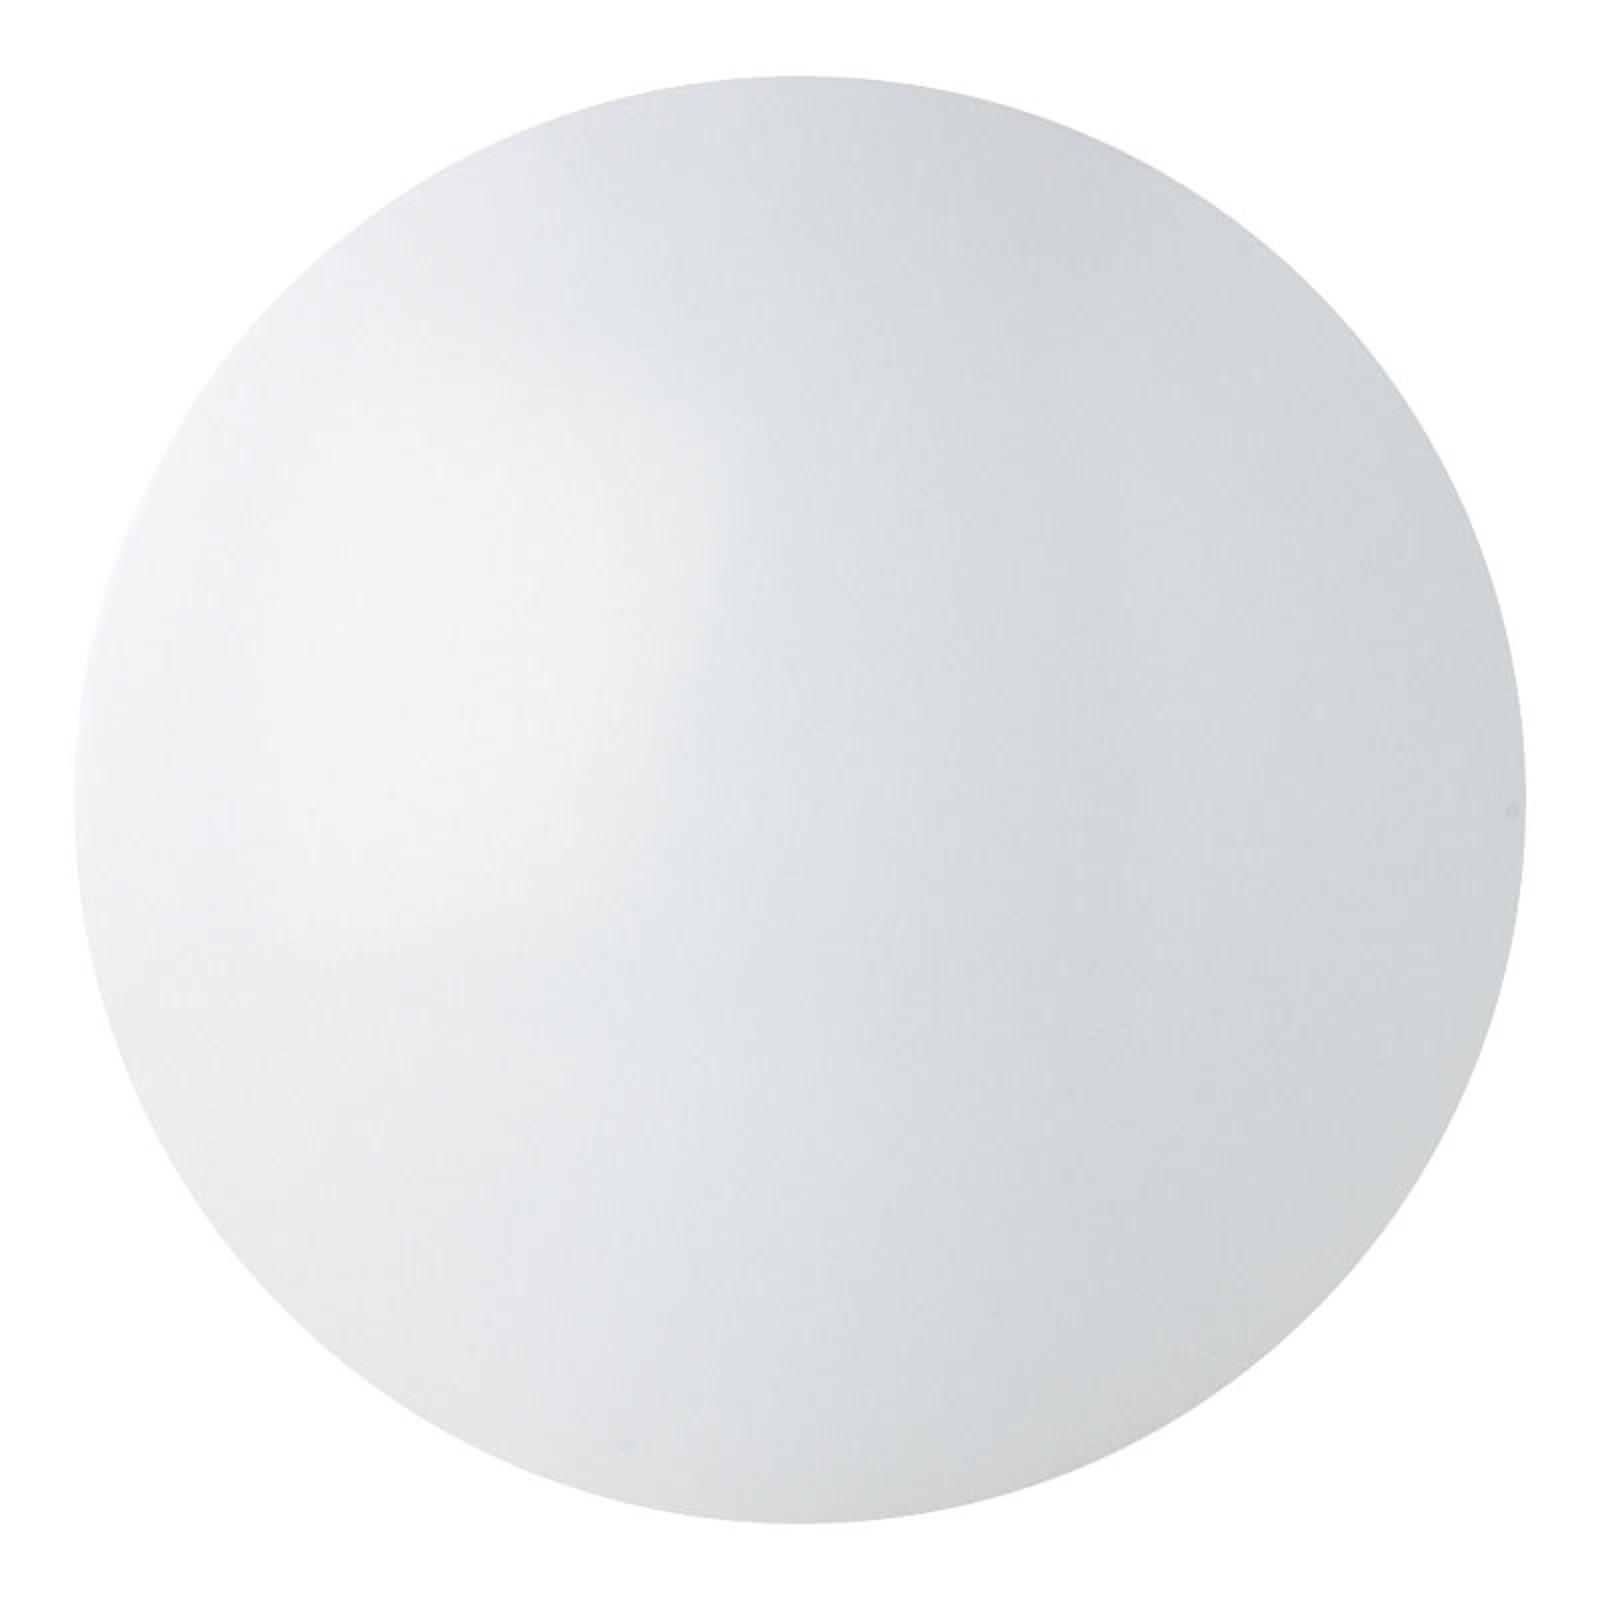 Plafonnier LED Renzo lumineux, 31,5W, 4000K